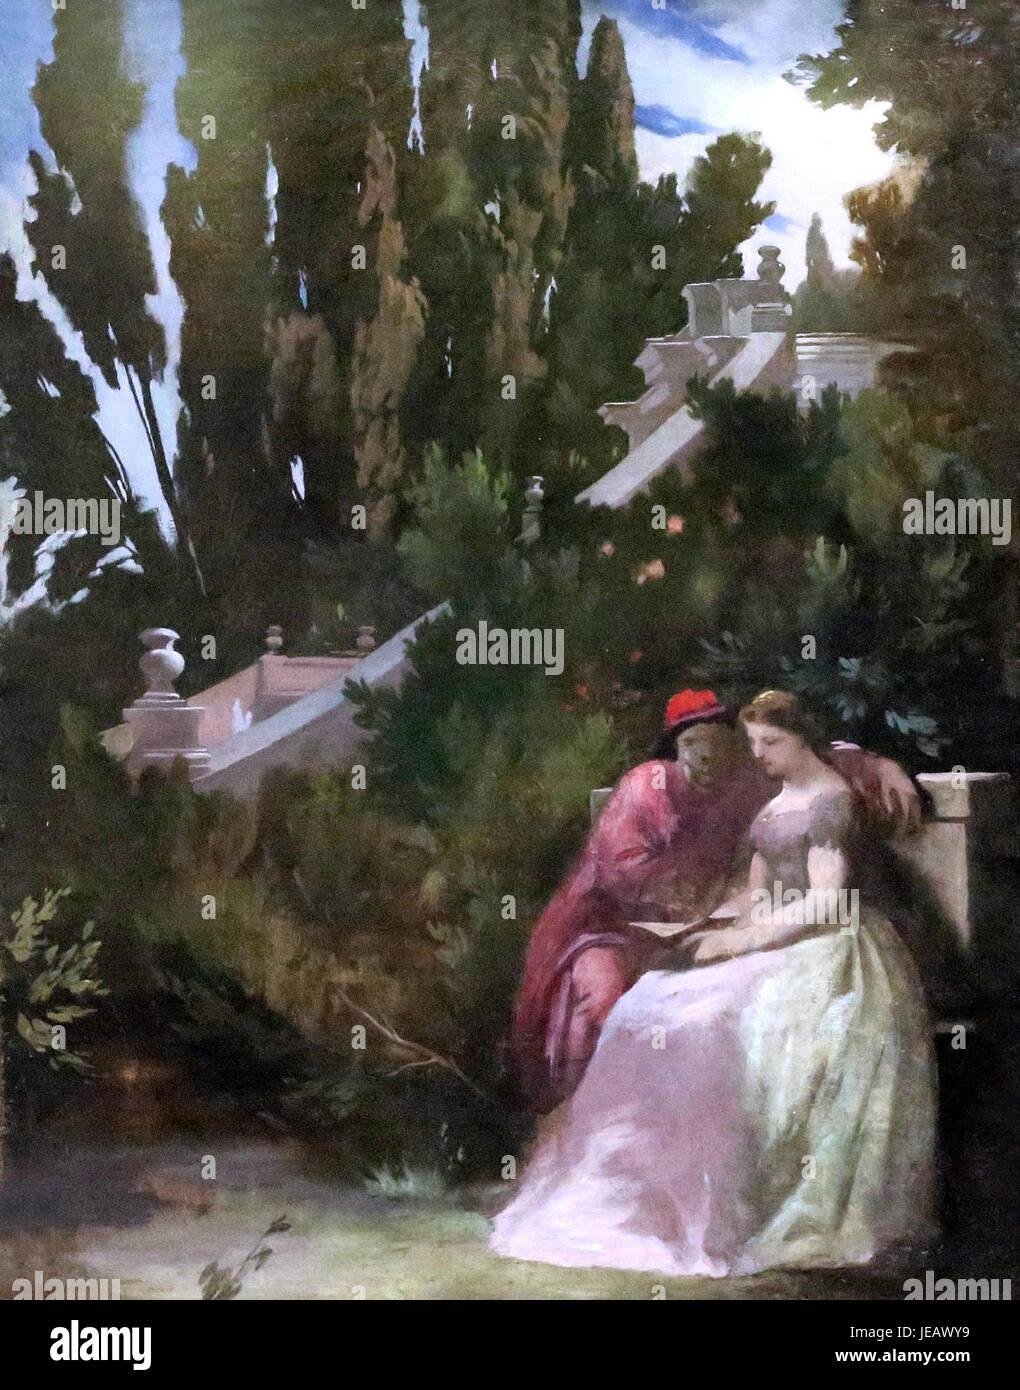 Anselm Feuerbach - Paolo und Francesca - Kunsthalle Mannheim Immagini Stock